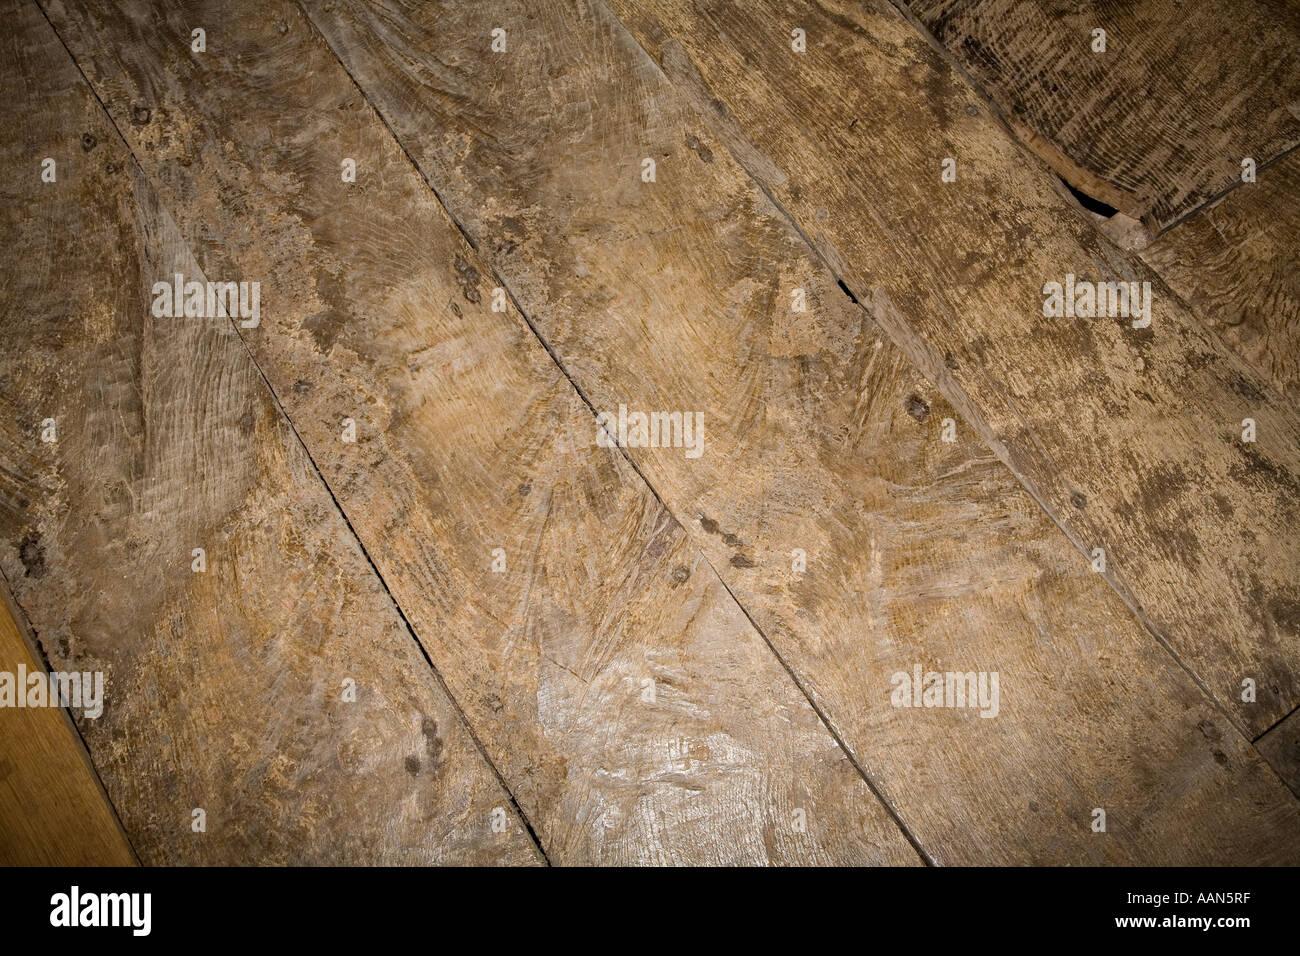 Worn old 15th century oak floorboards in manor house Treowen Wales UK Stock Photo